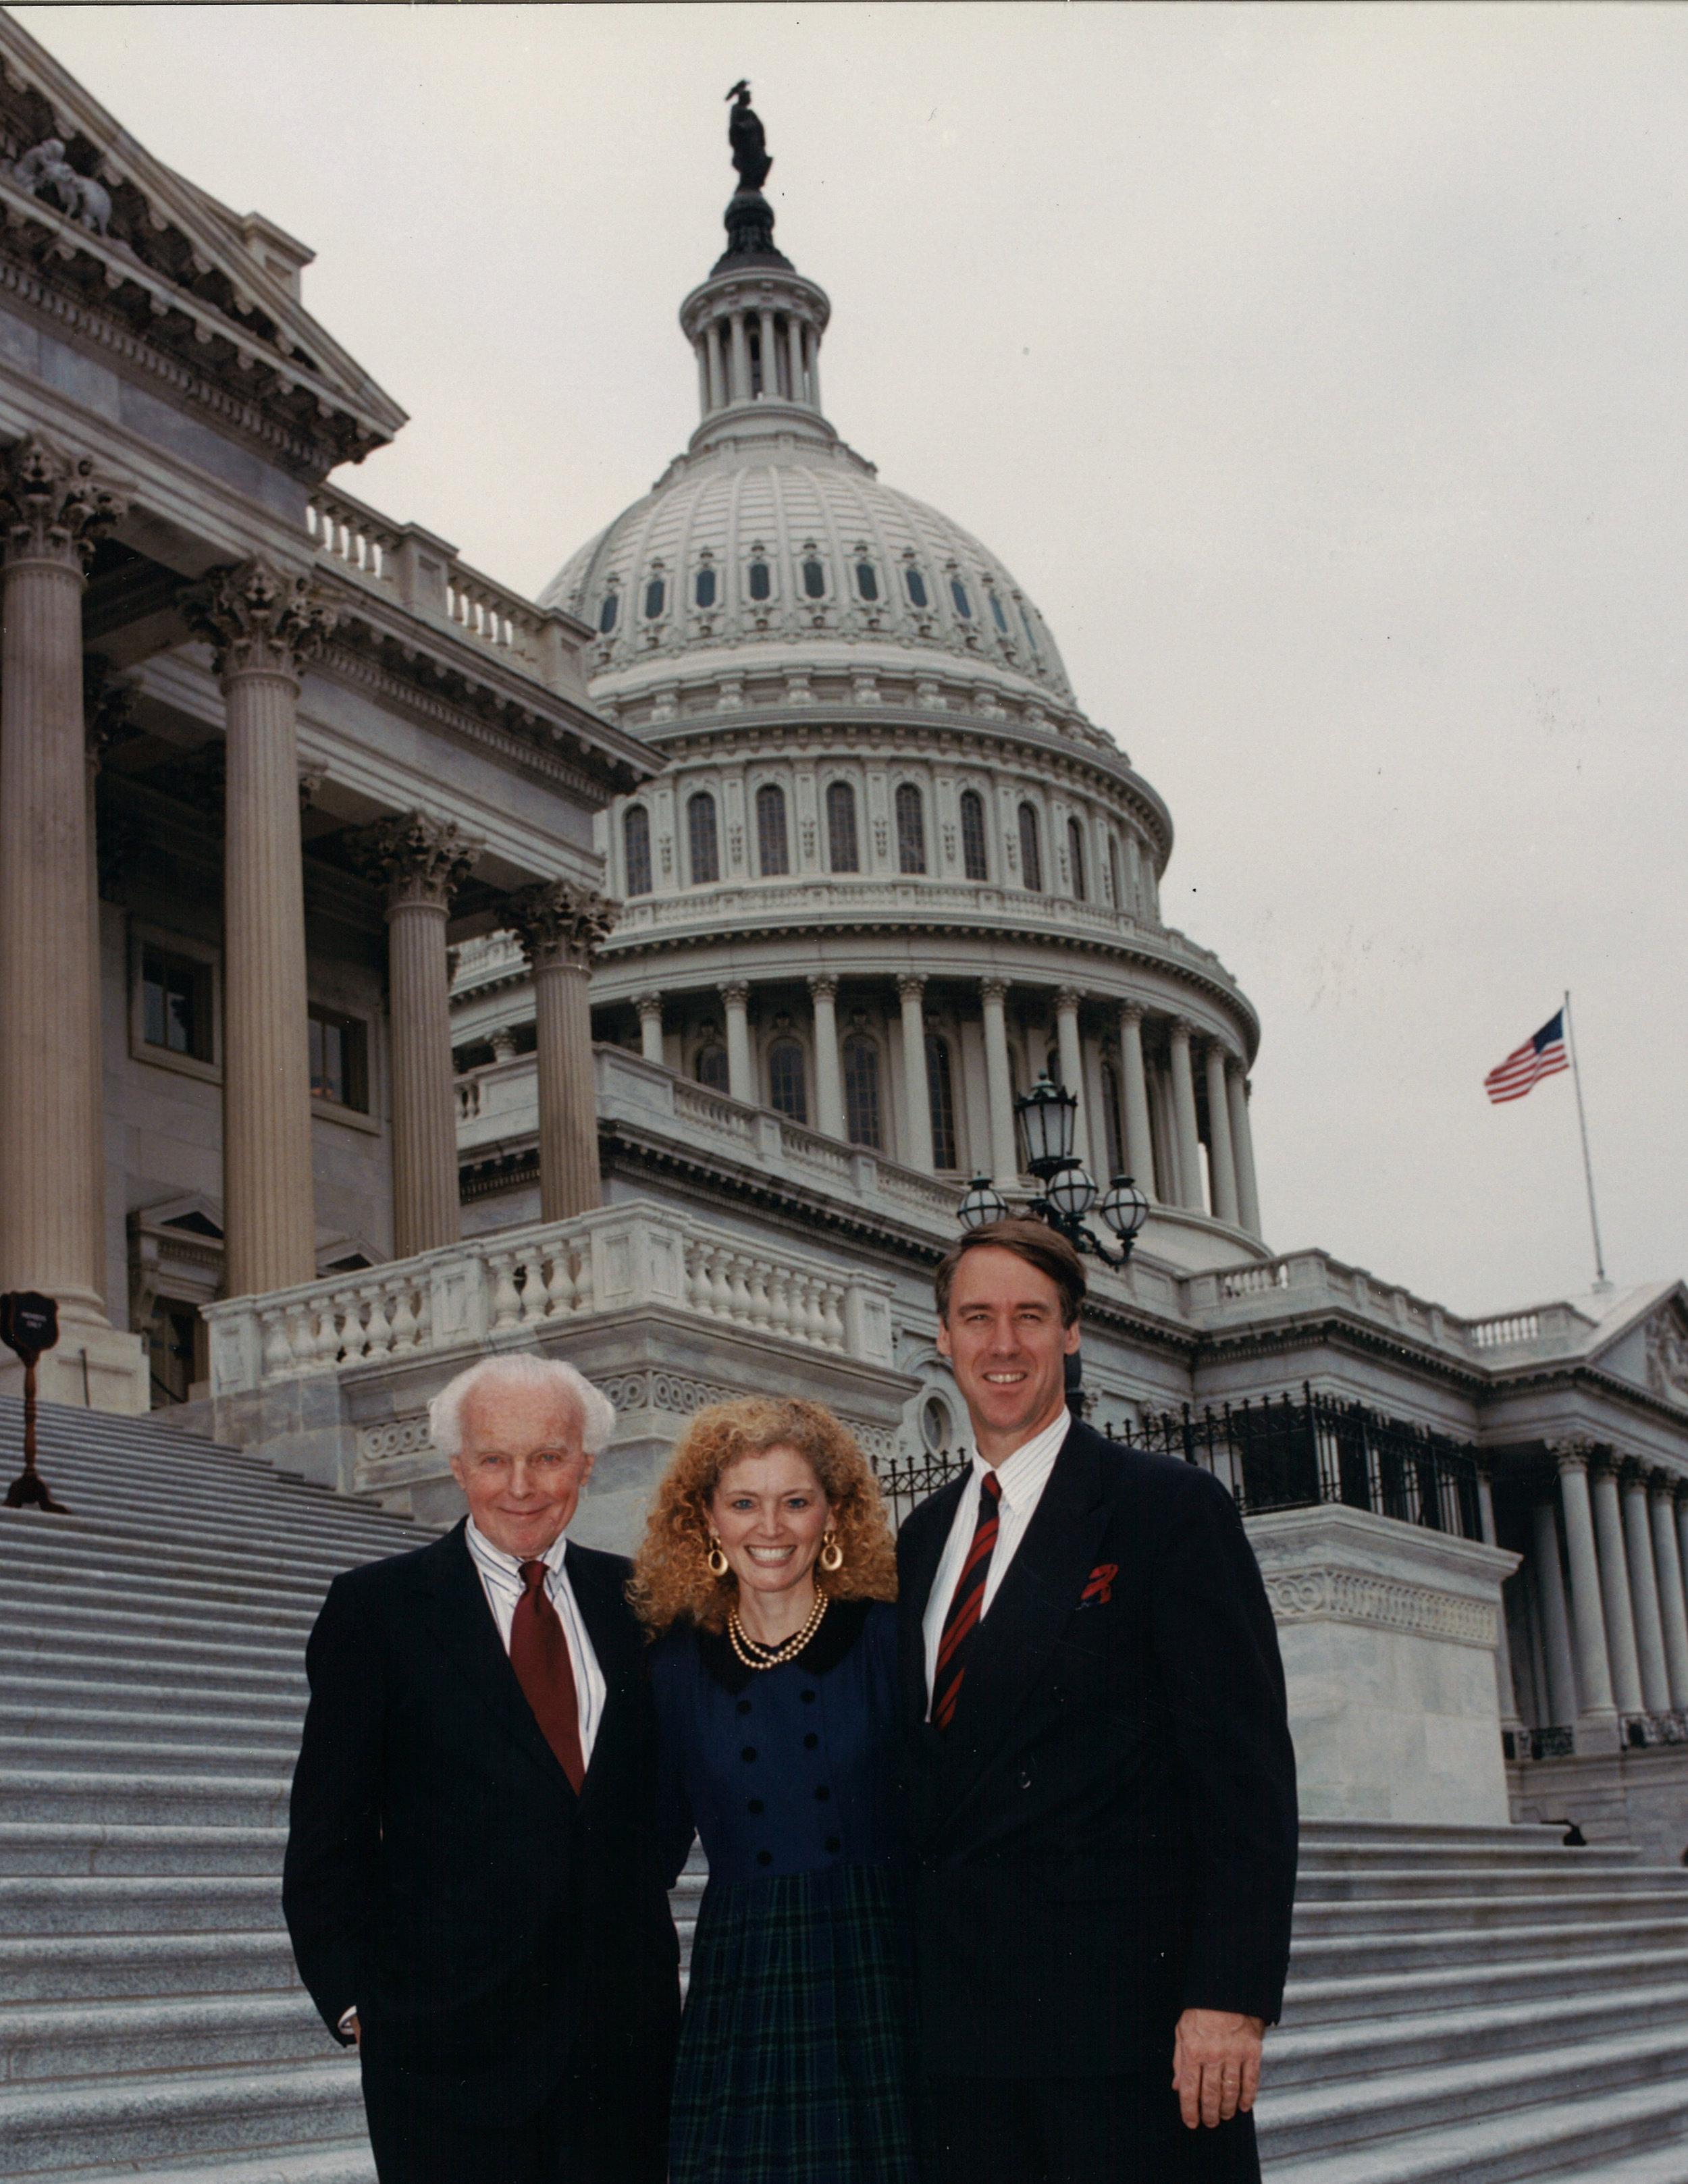 Katrina Lantos Swett with her father Tom Lantos and her husband Ambassador Richard Swett.